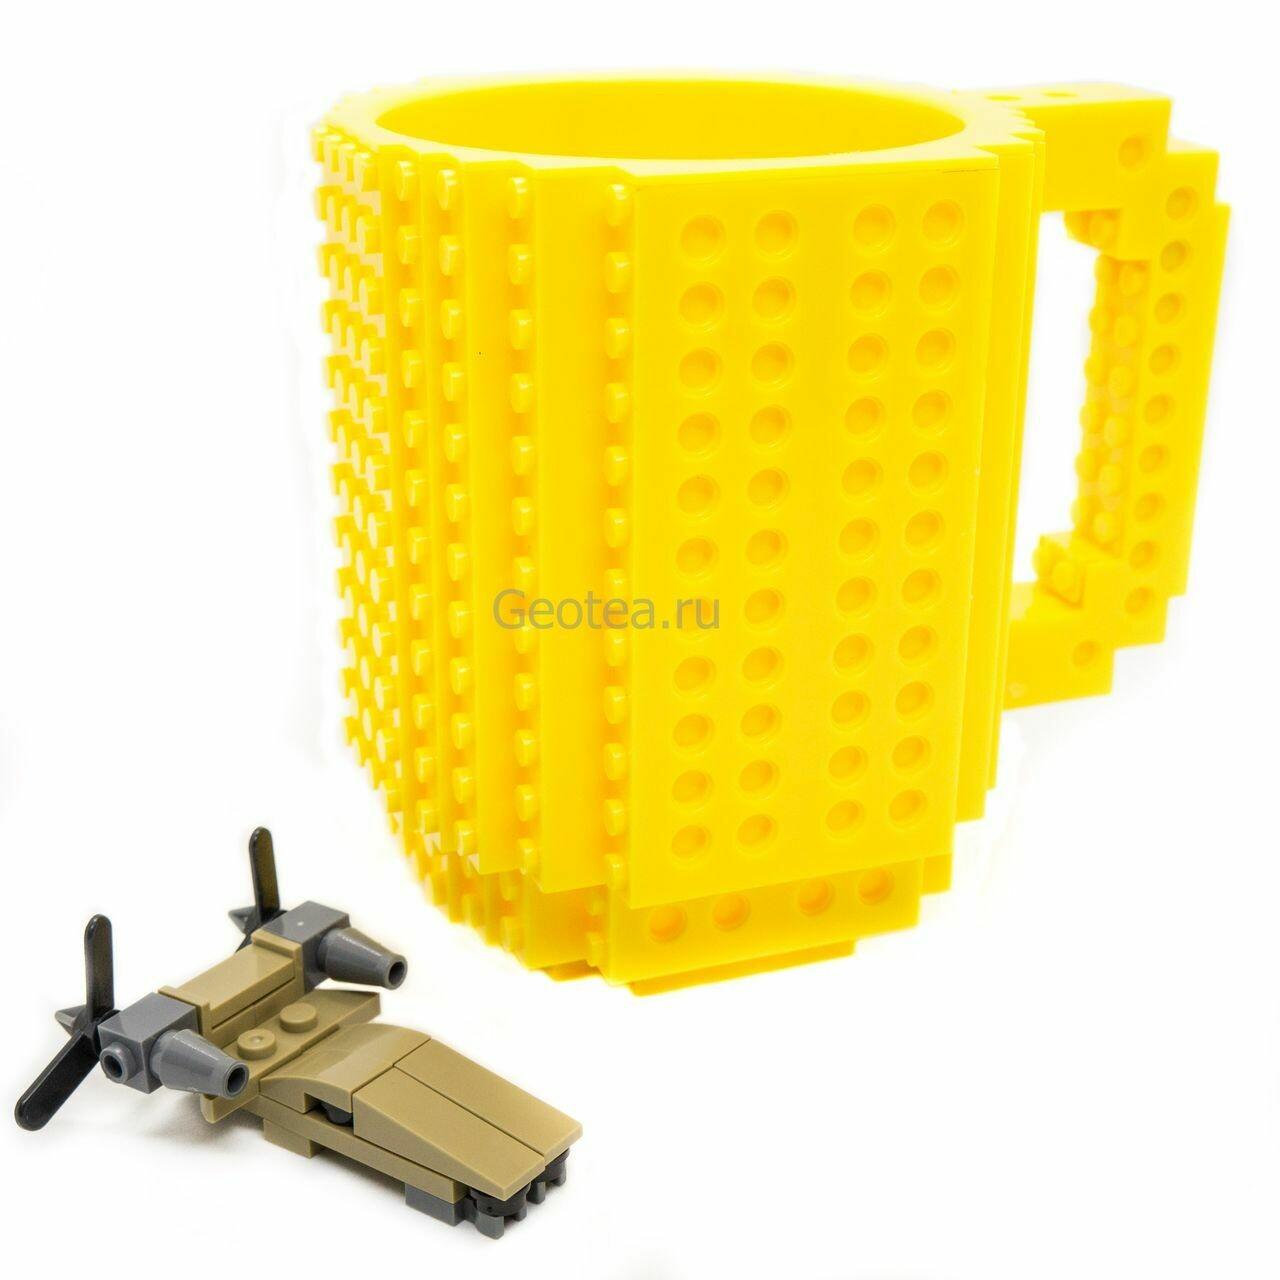 Кружка в стиле Лего 350 мл. желтая с мини набором